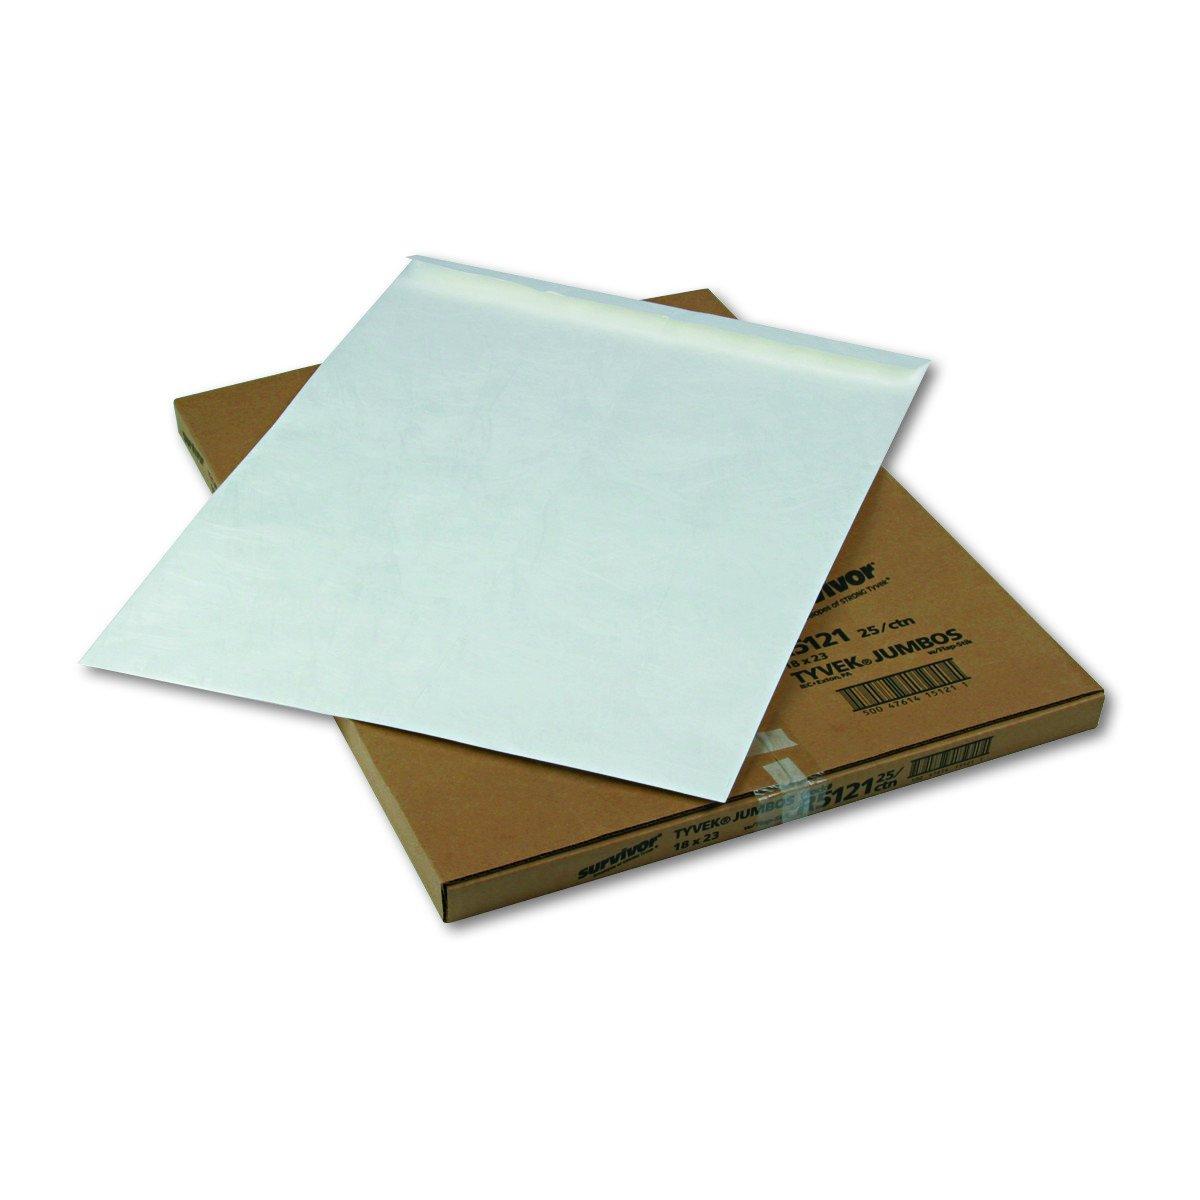 Quality Park R5121 Quality Park Tyvek Heavyweight Jumbo Envelopes, 18x23, White, 25/Box